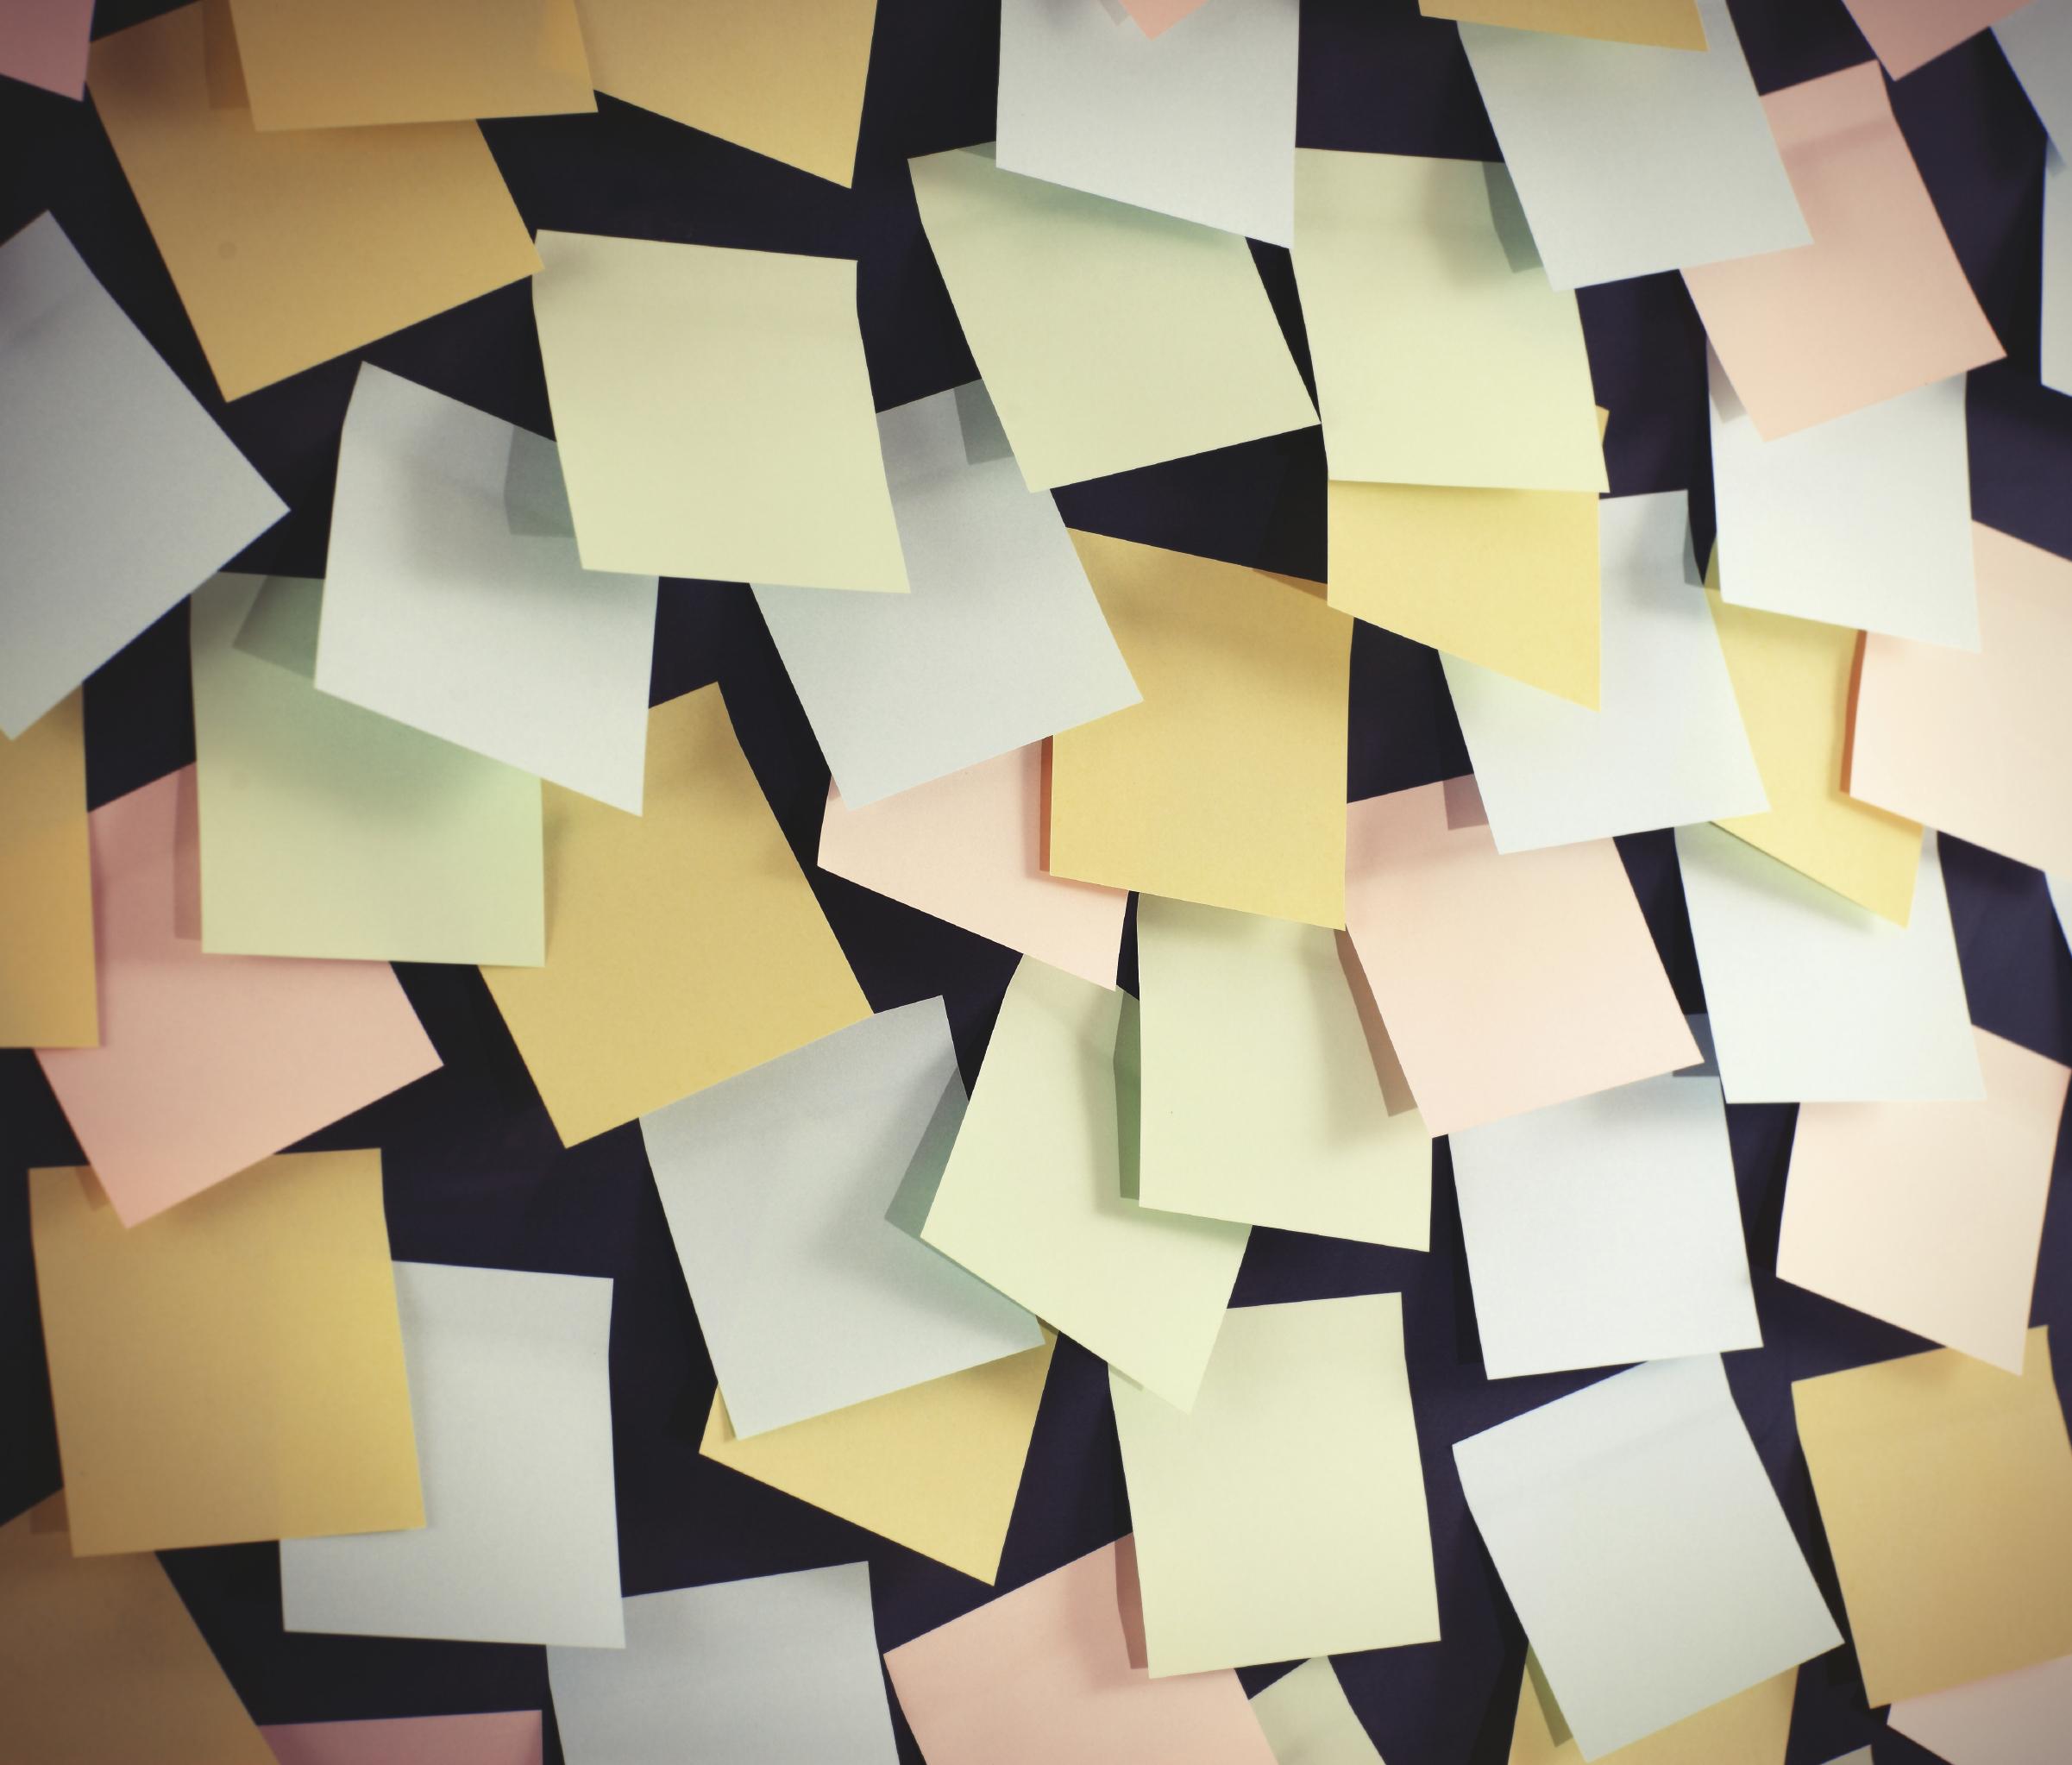 5 Sticky Posts on Leadership